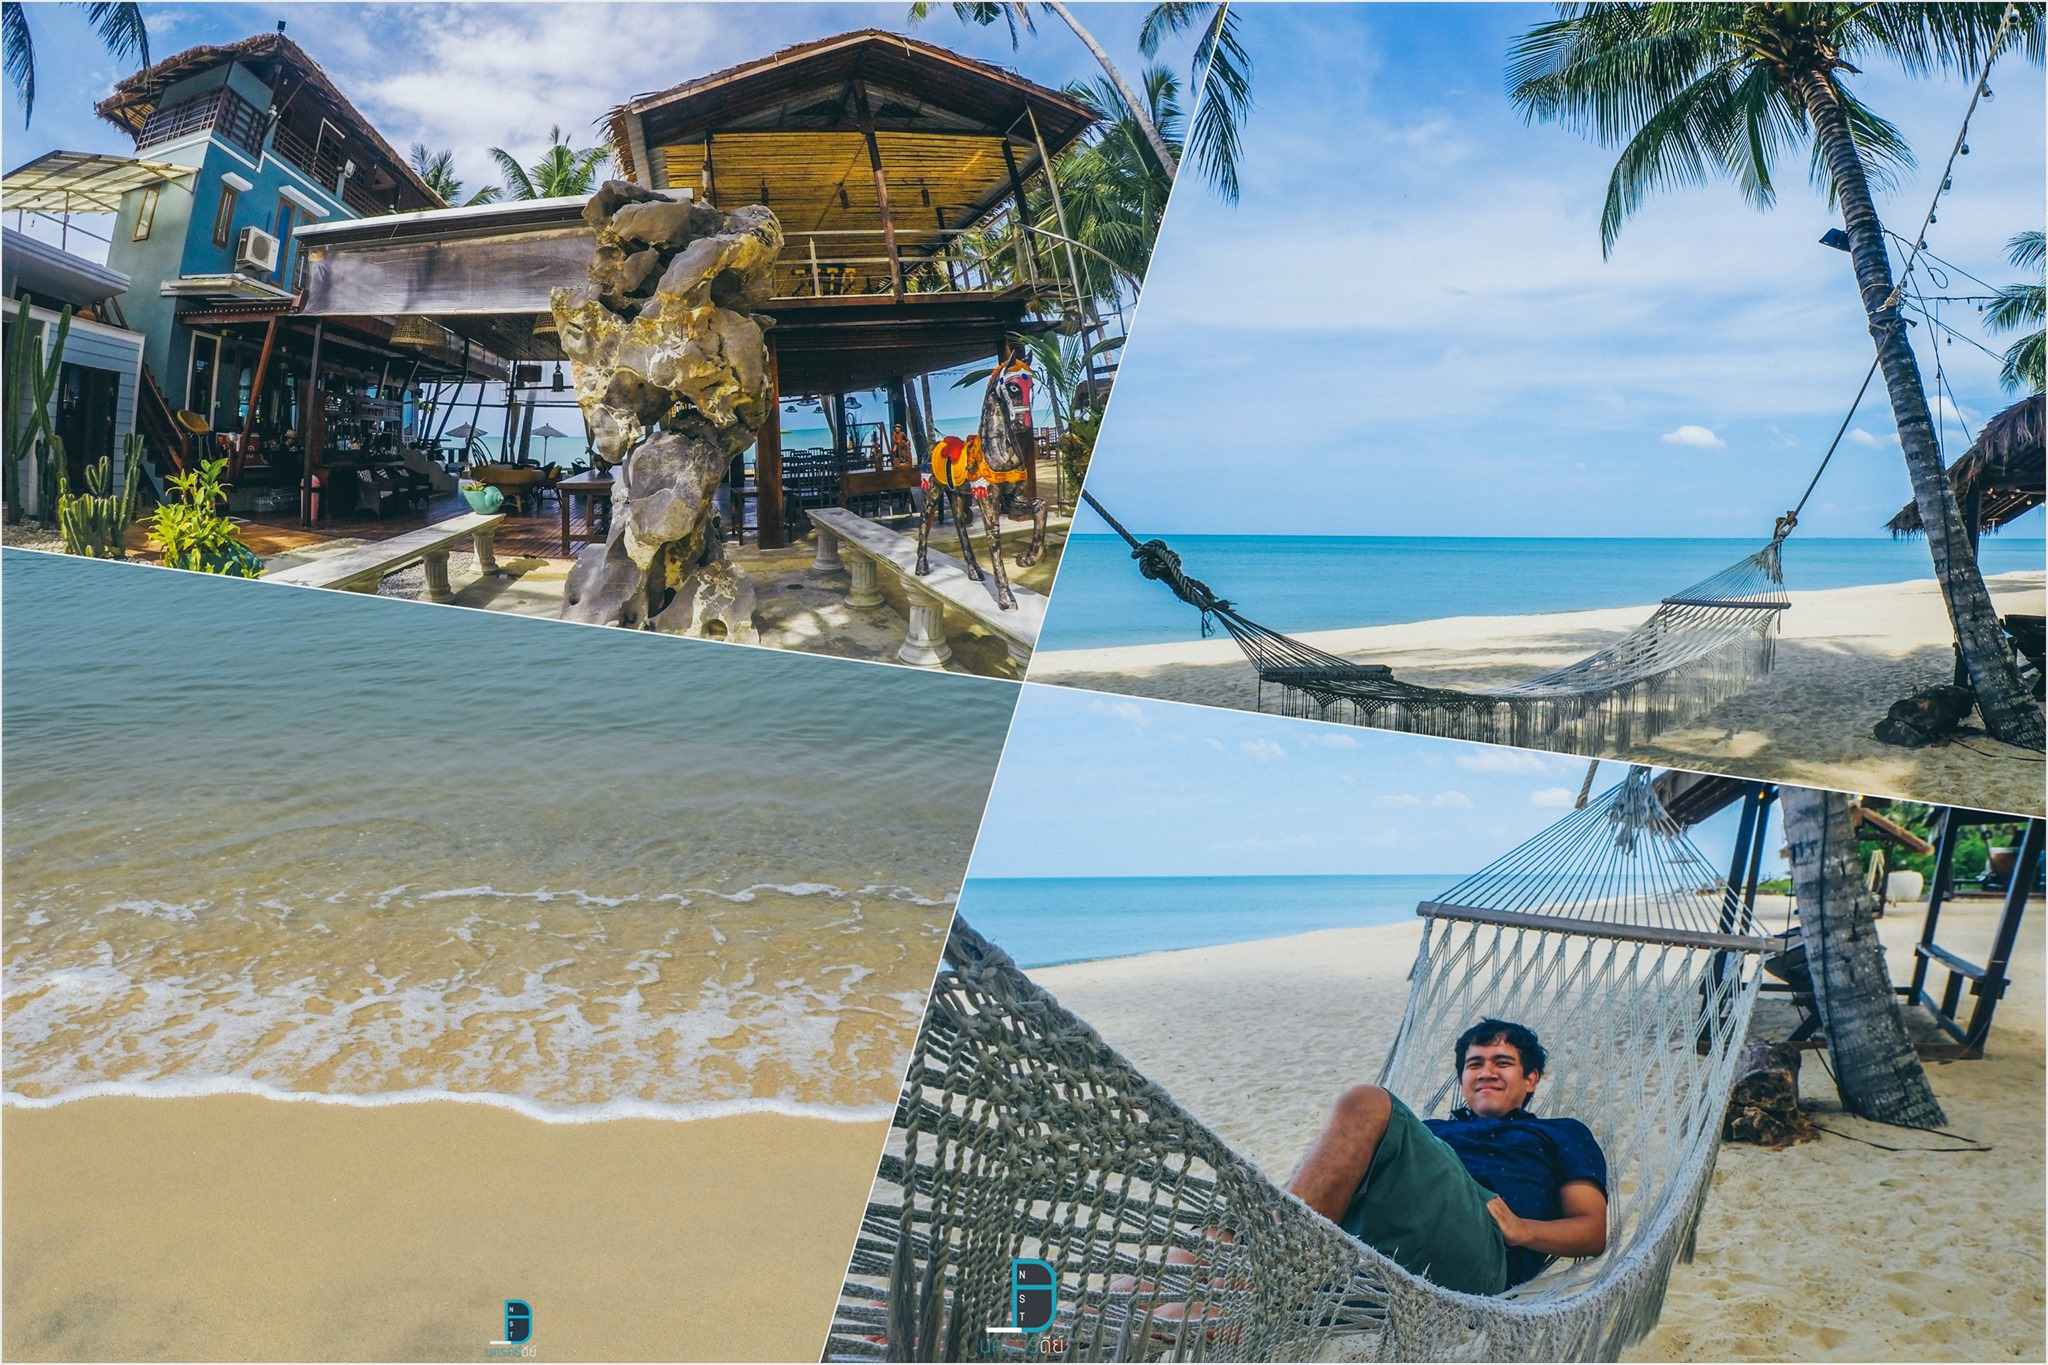 19.-Beach-Walk-Homestay-https://nakhonsidee.com/show/read/2/134  checkin,nakhonsithammarat,ของกิน,ร้านอาหาร,จุดเช็คอิน,ที่เที่ยว